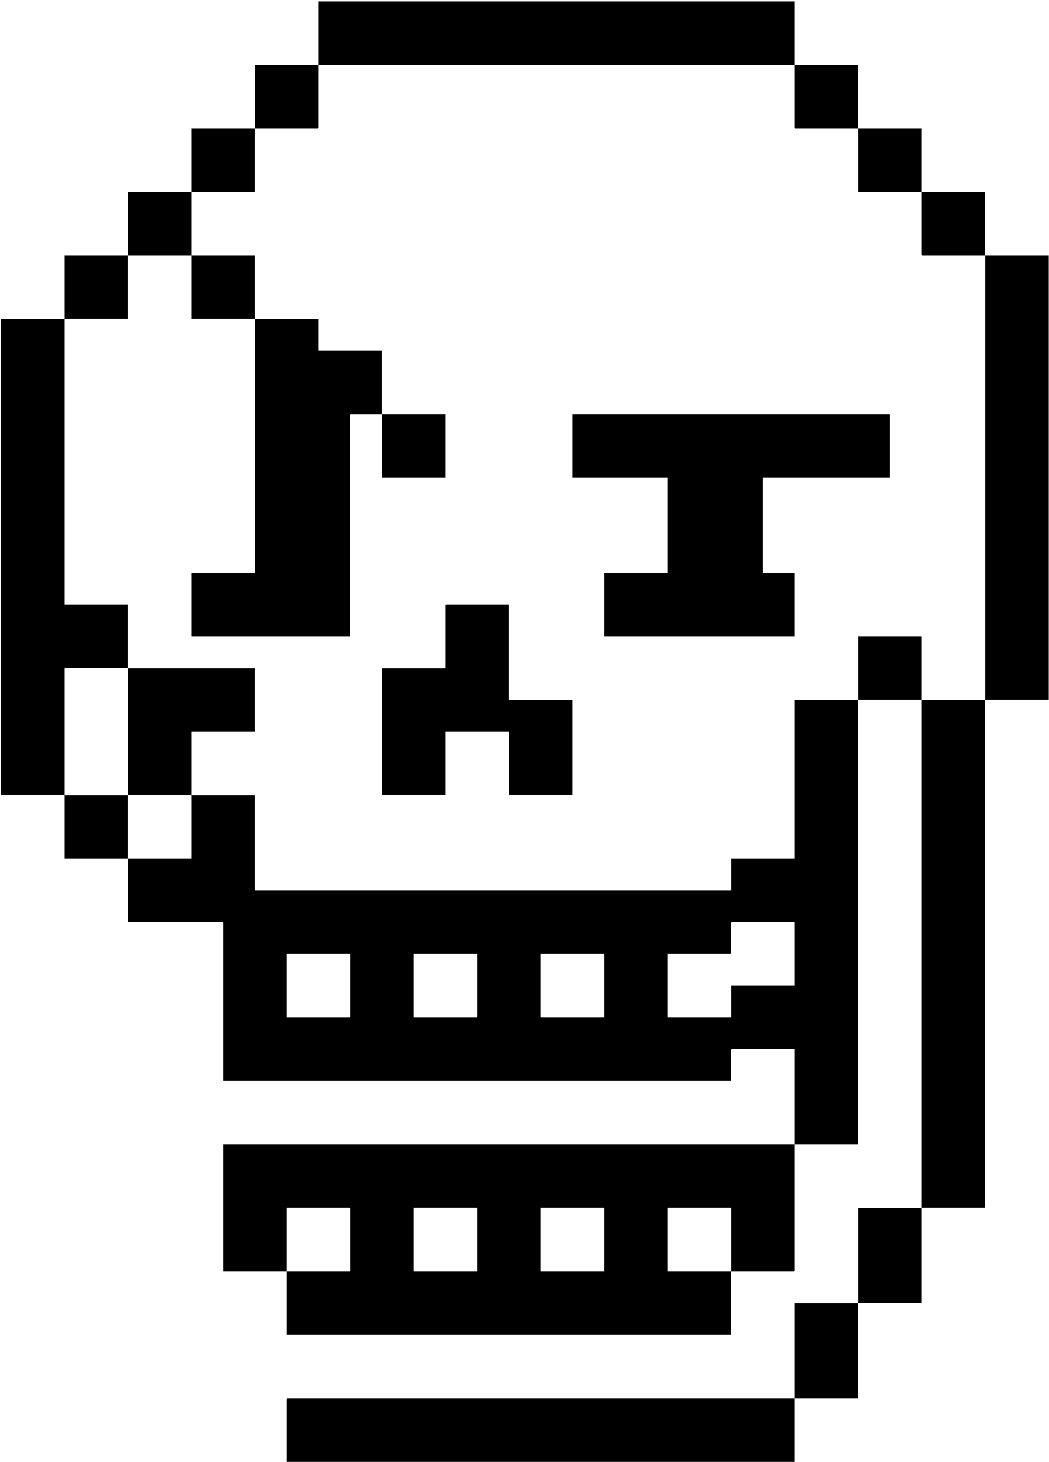 Papyrus Face Png - No Face Pixel Art (1600x1600), Png Download